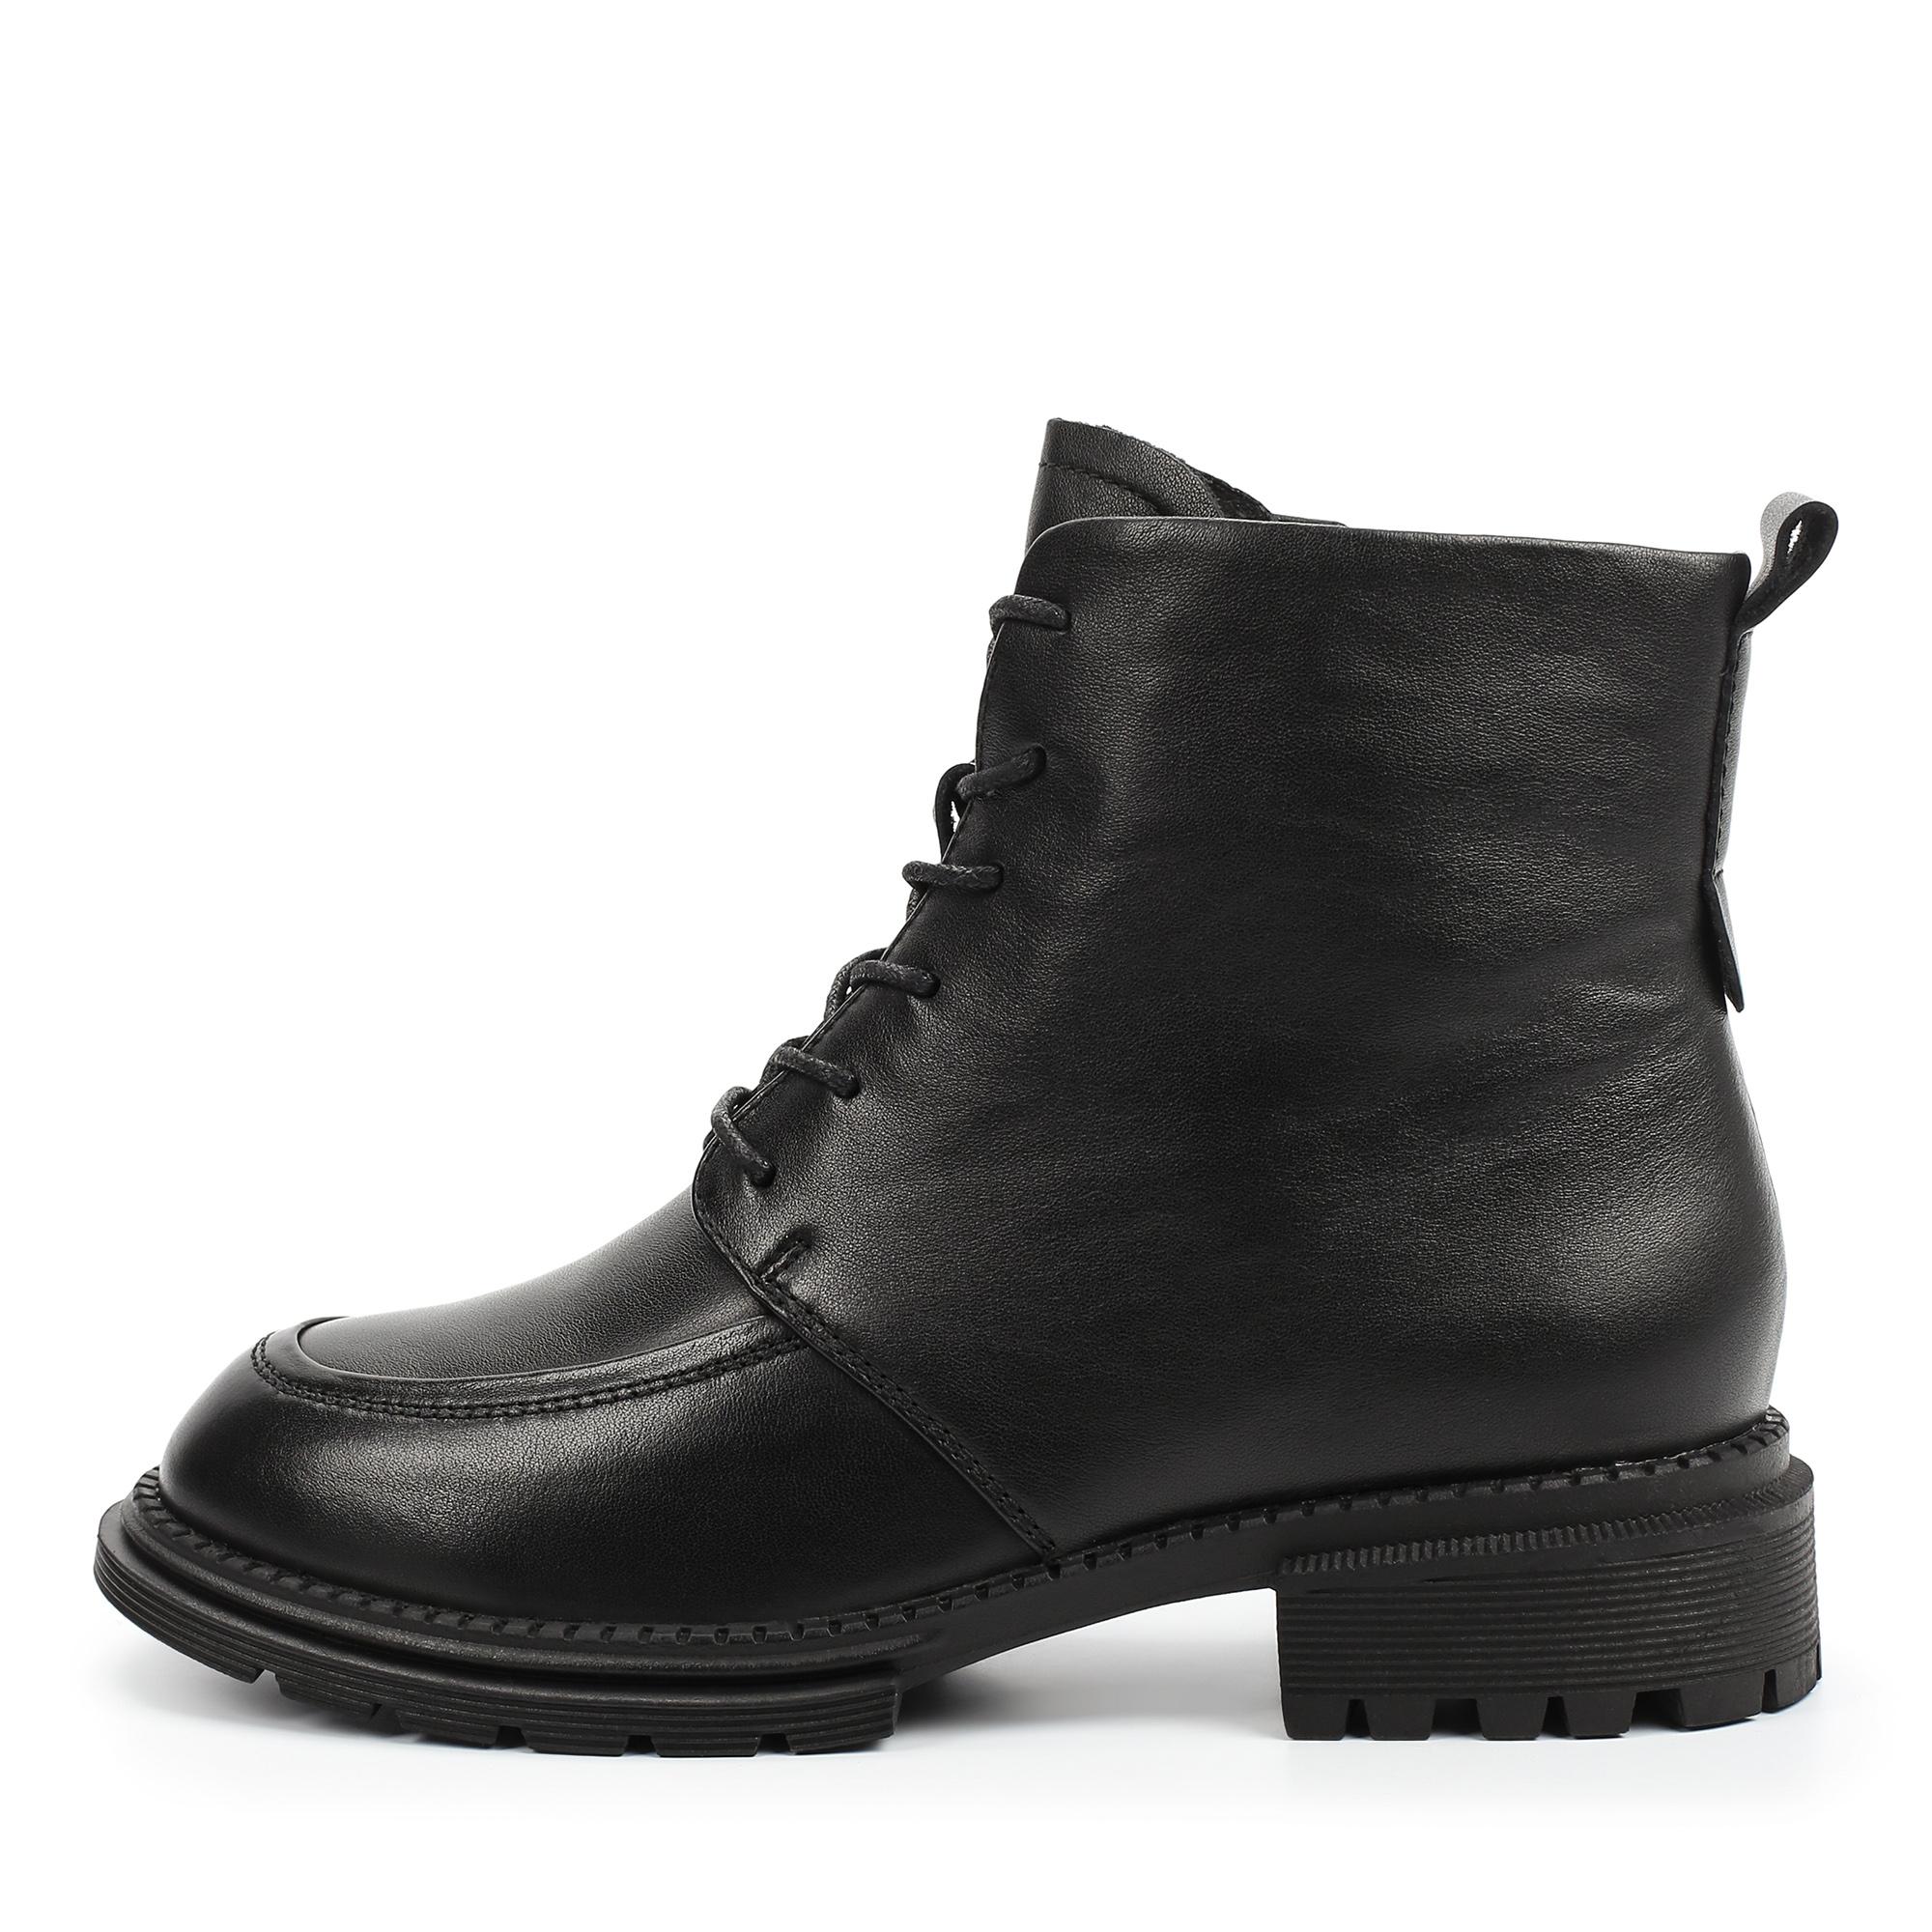 Ботинки Thomas Munz 140-070A-2102